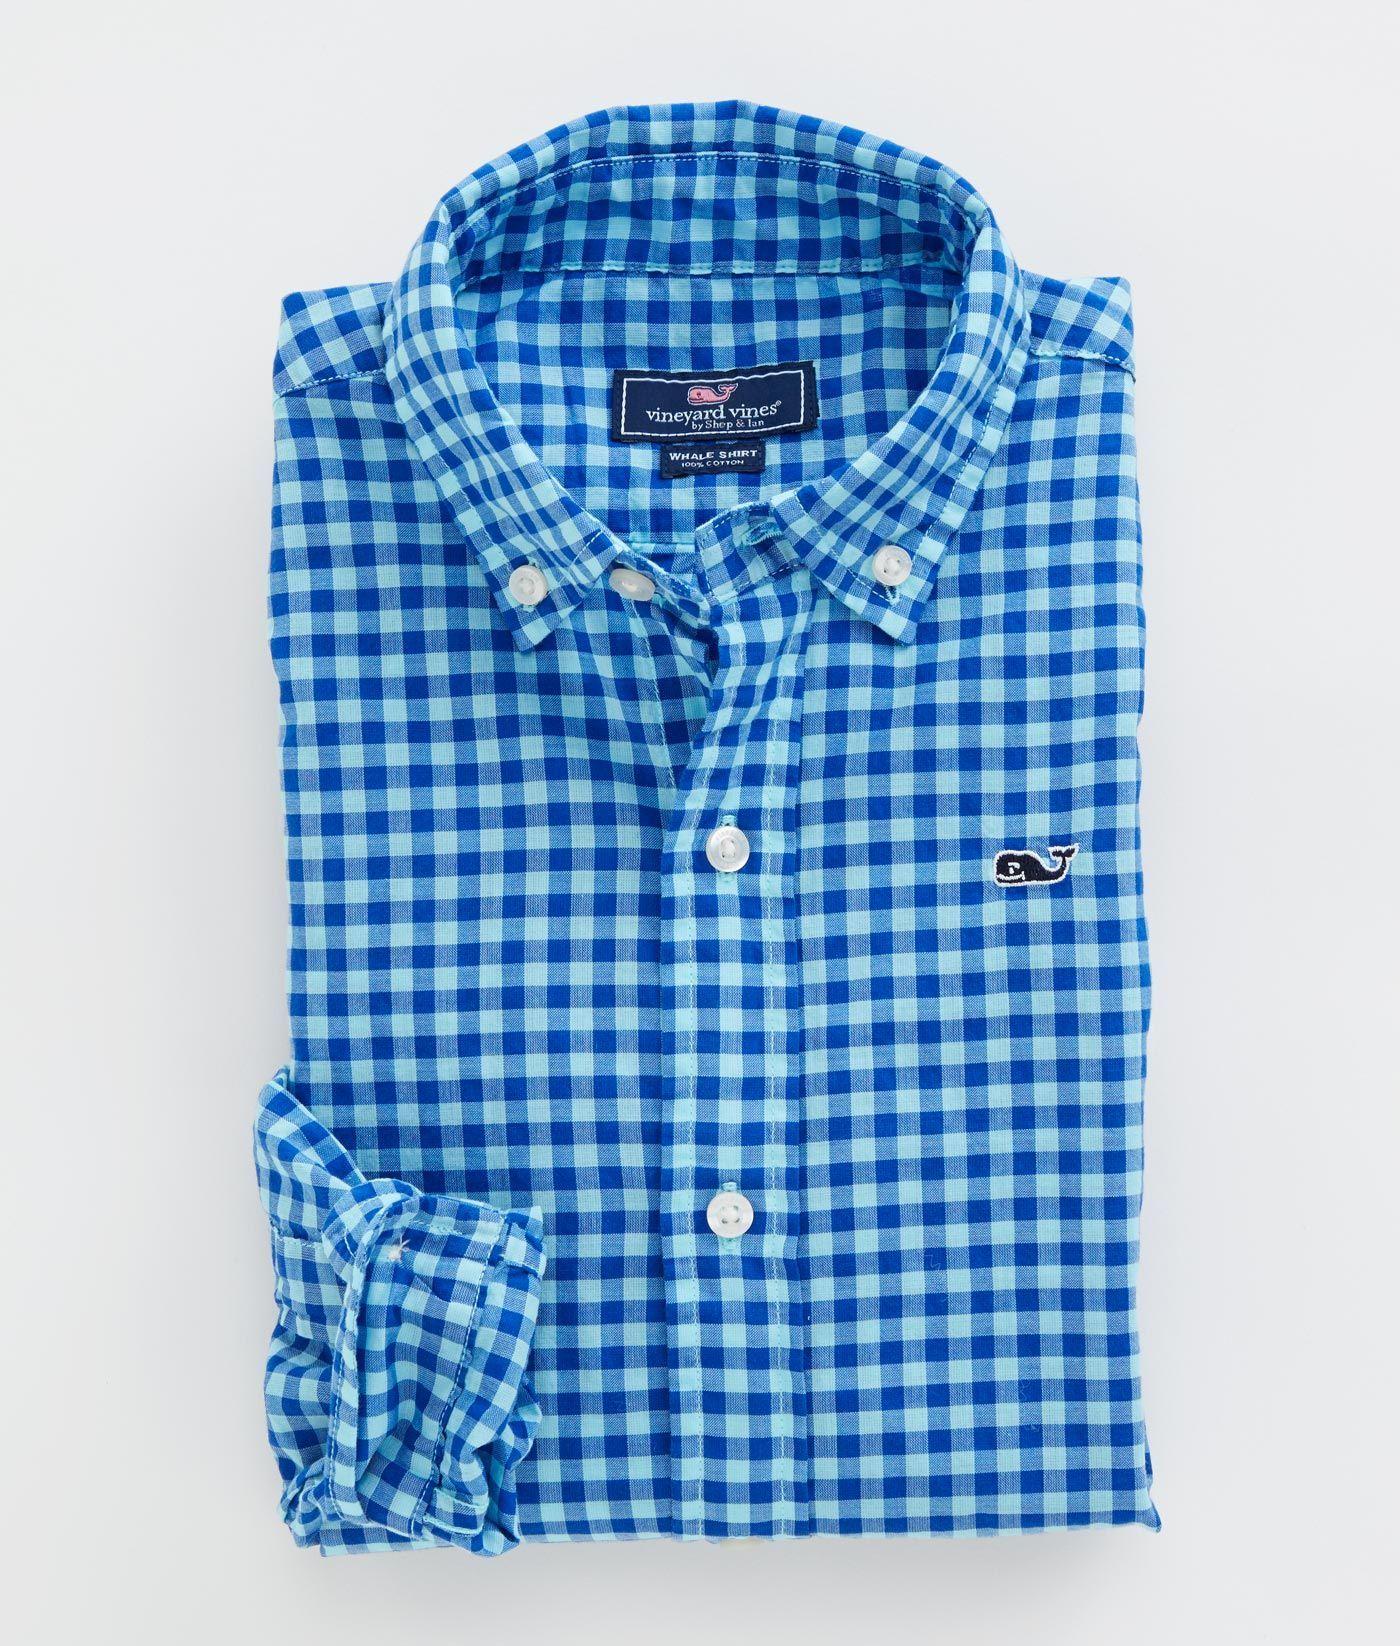 ef38484efa0 Boys' Sport Shirts: Boys Inslet Gingham Whale Shirt - Vineyard Vines ...